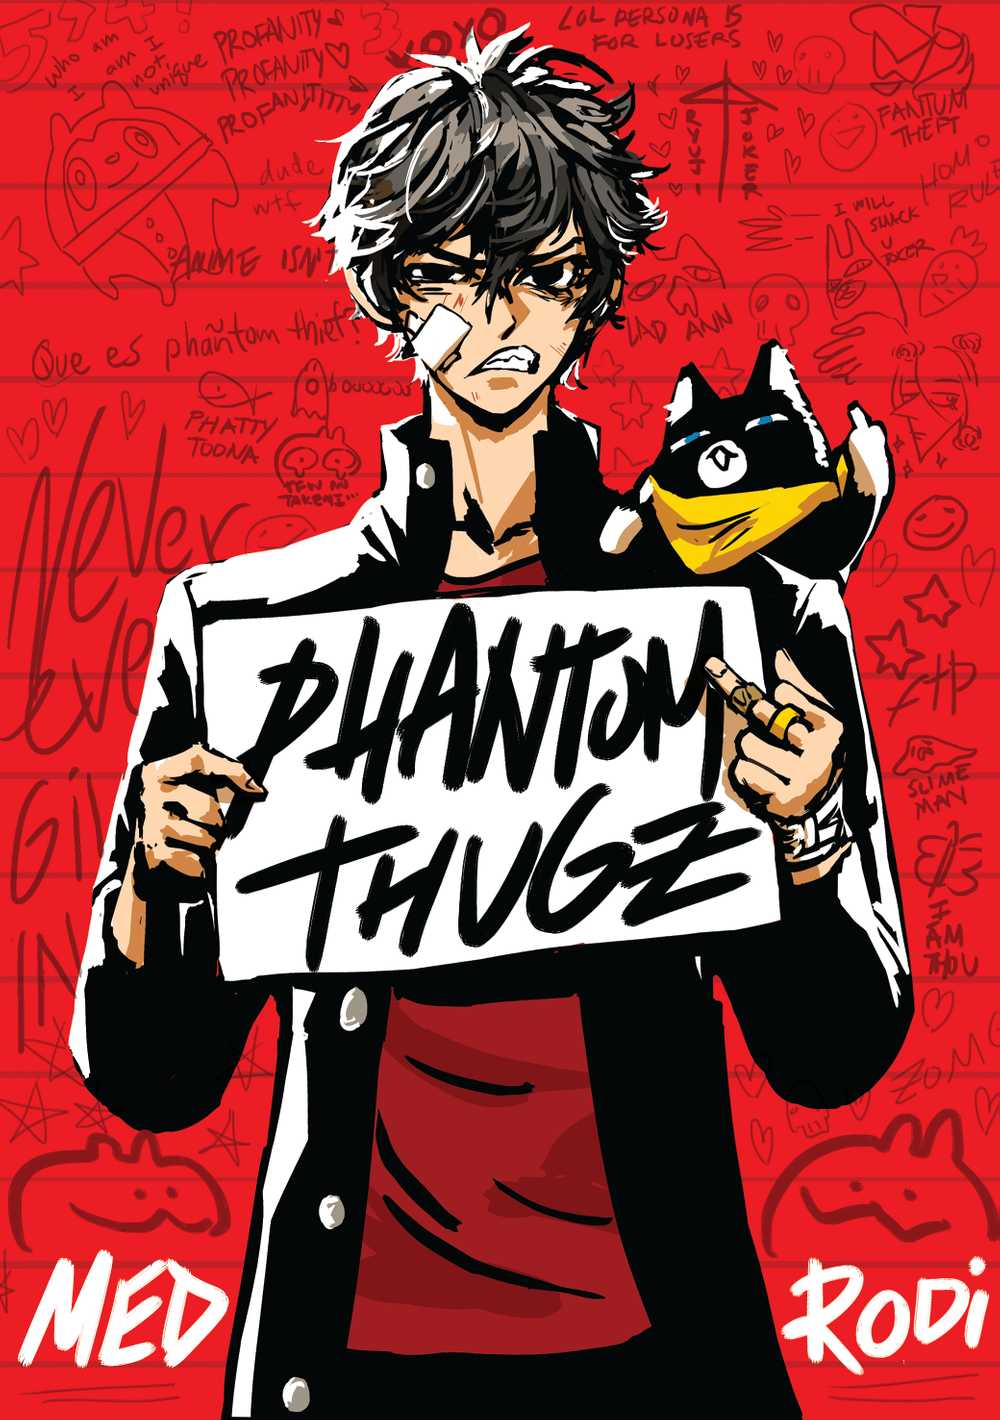 PERSONA 5 / phantom thugz zine